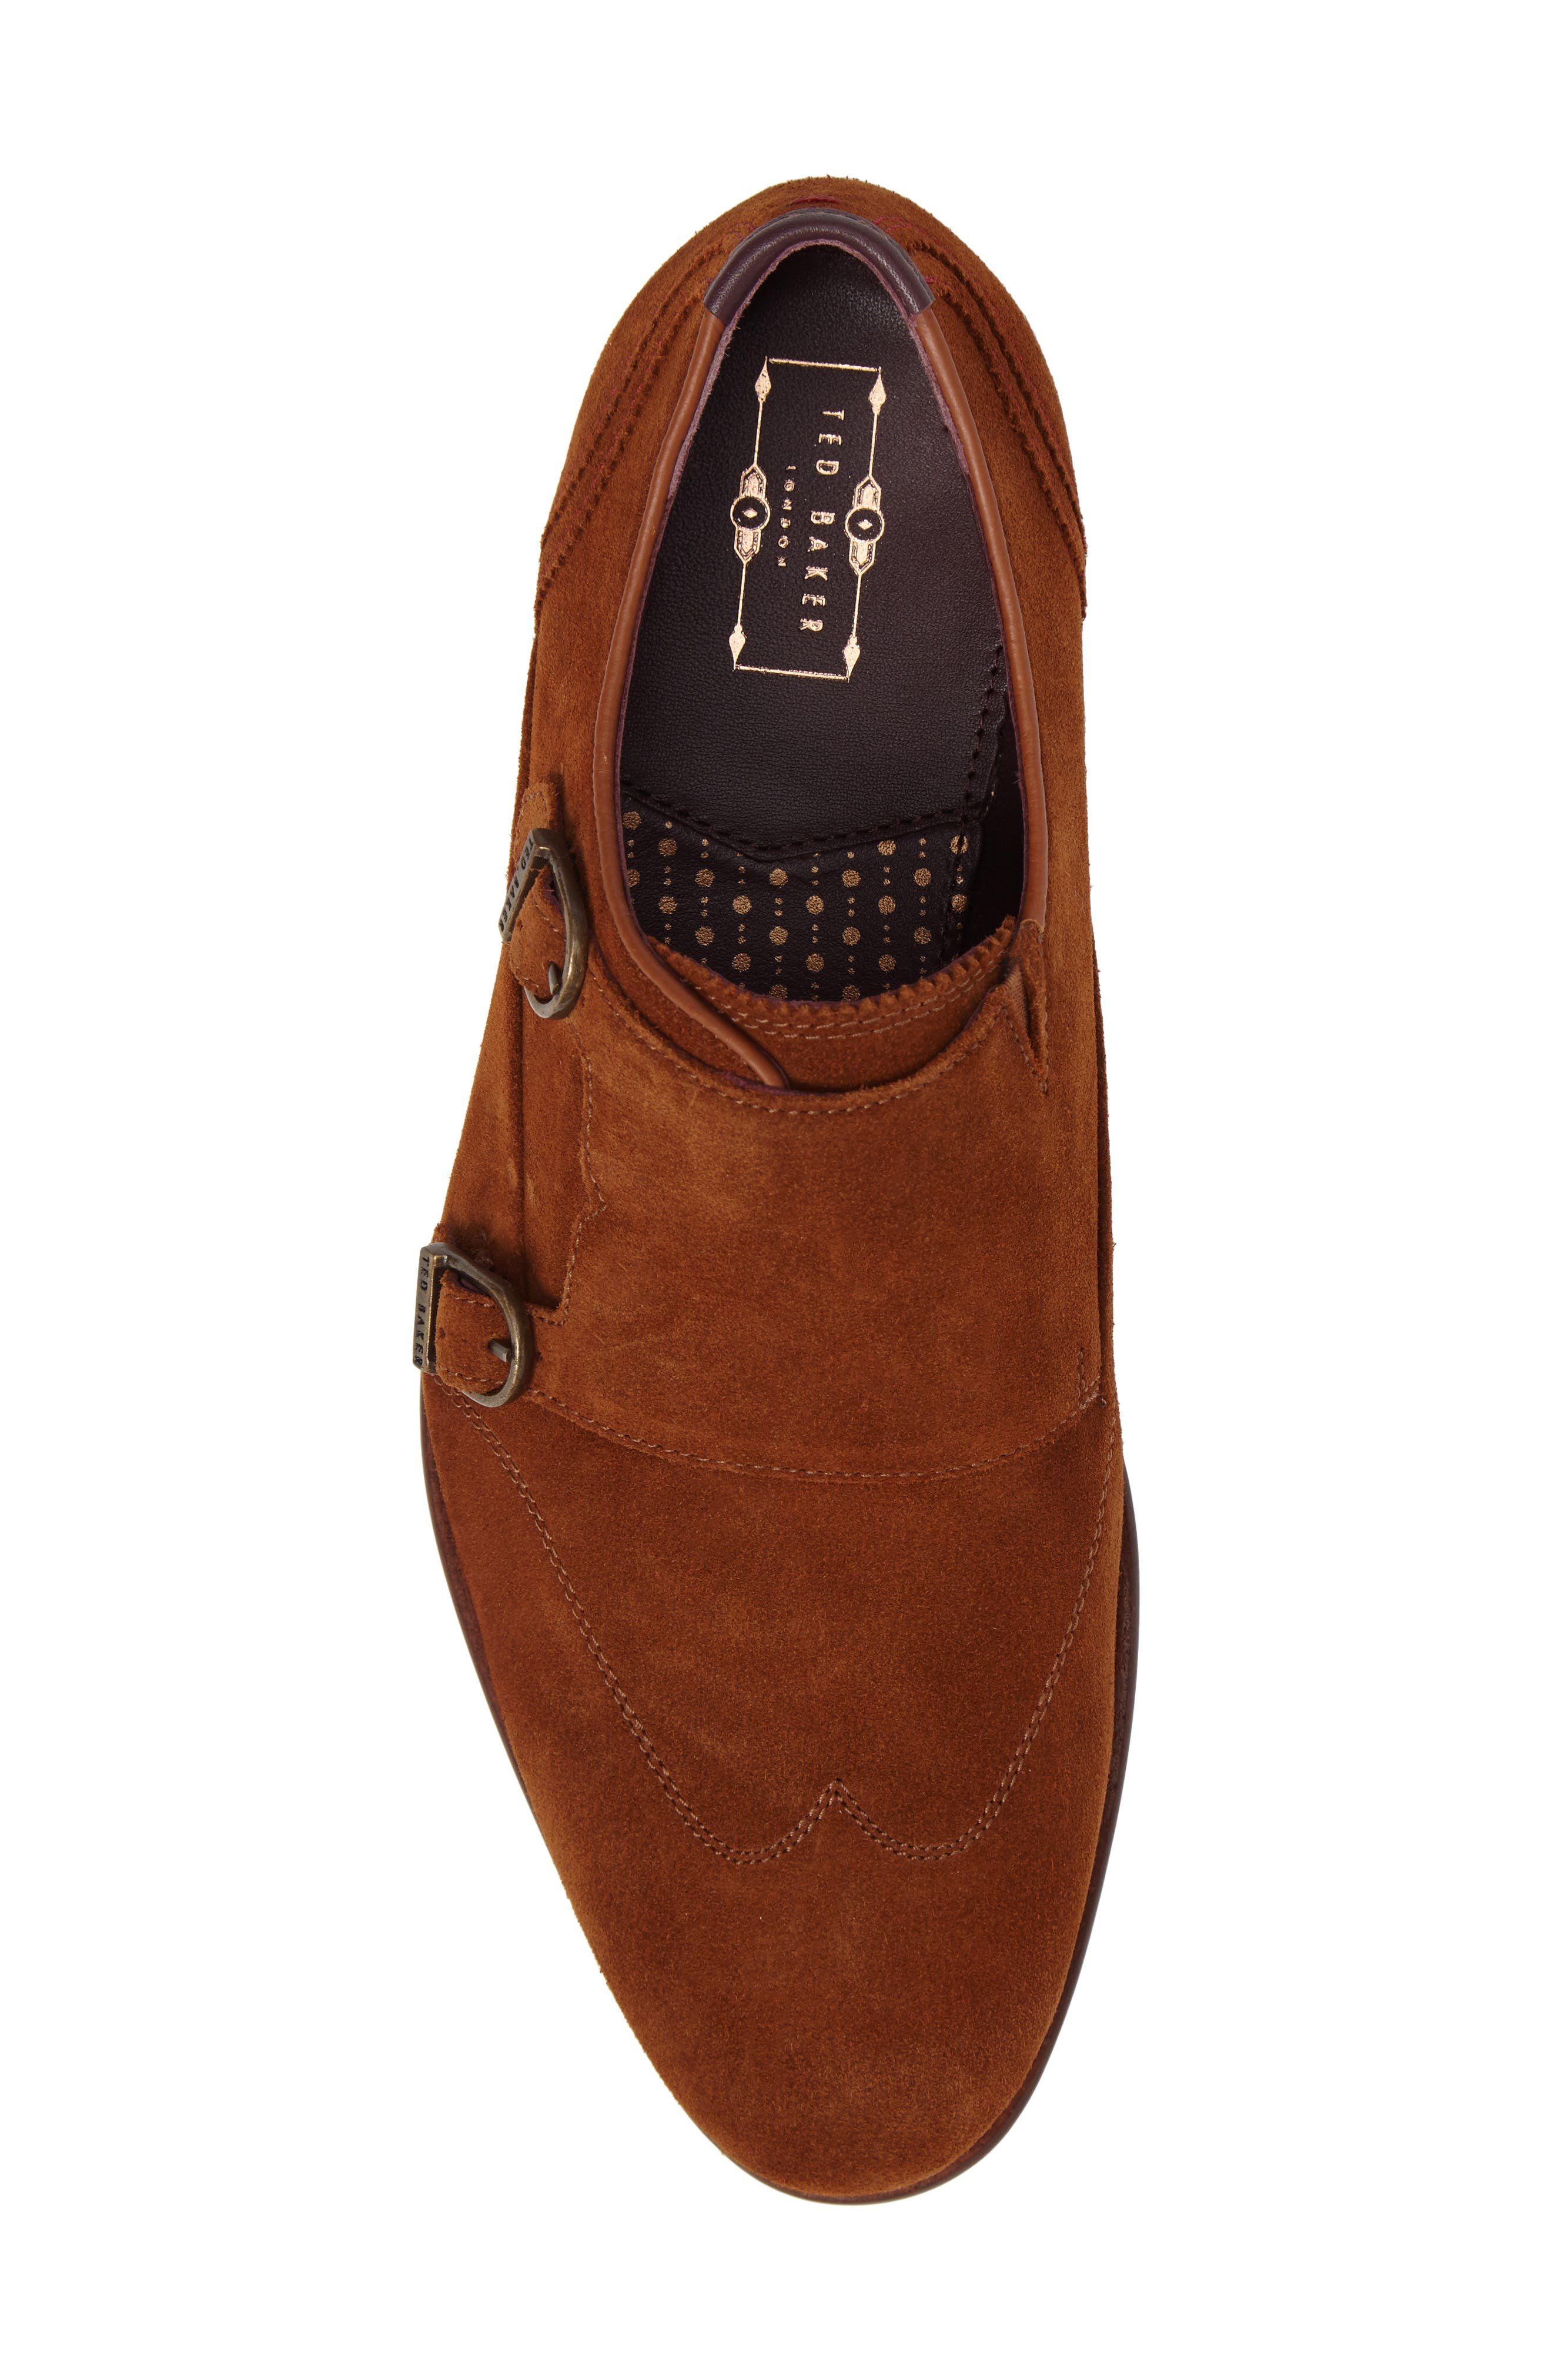 Rovere Wingtip Monk Shoe,                             Alternate thumbnail 5, color,                             Tan Suede